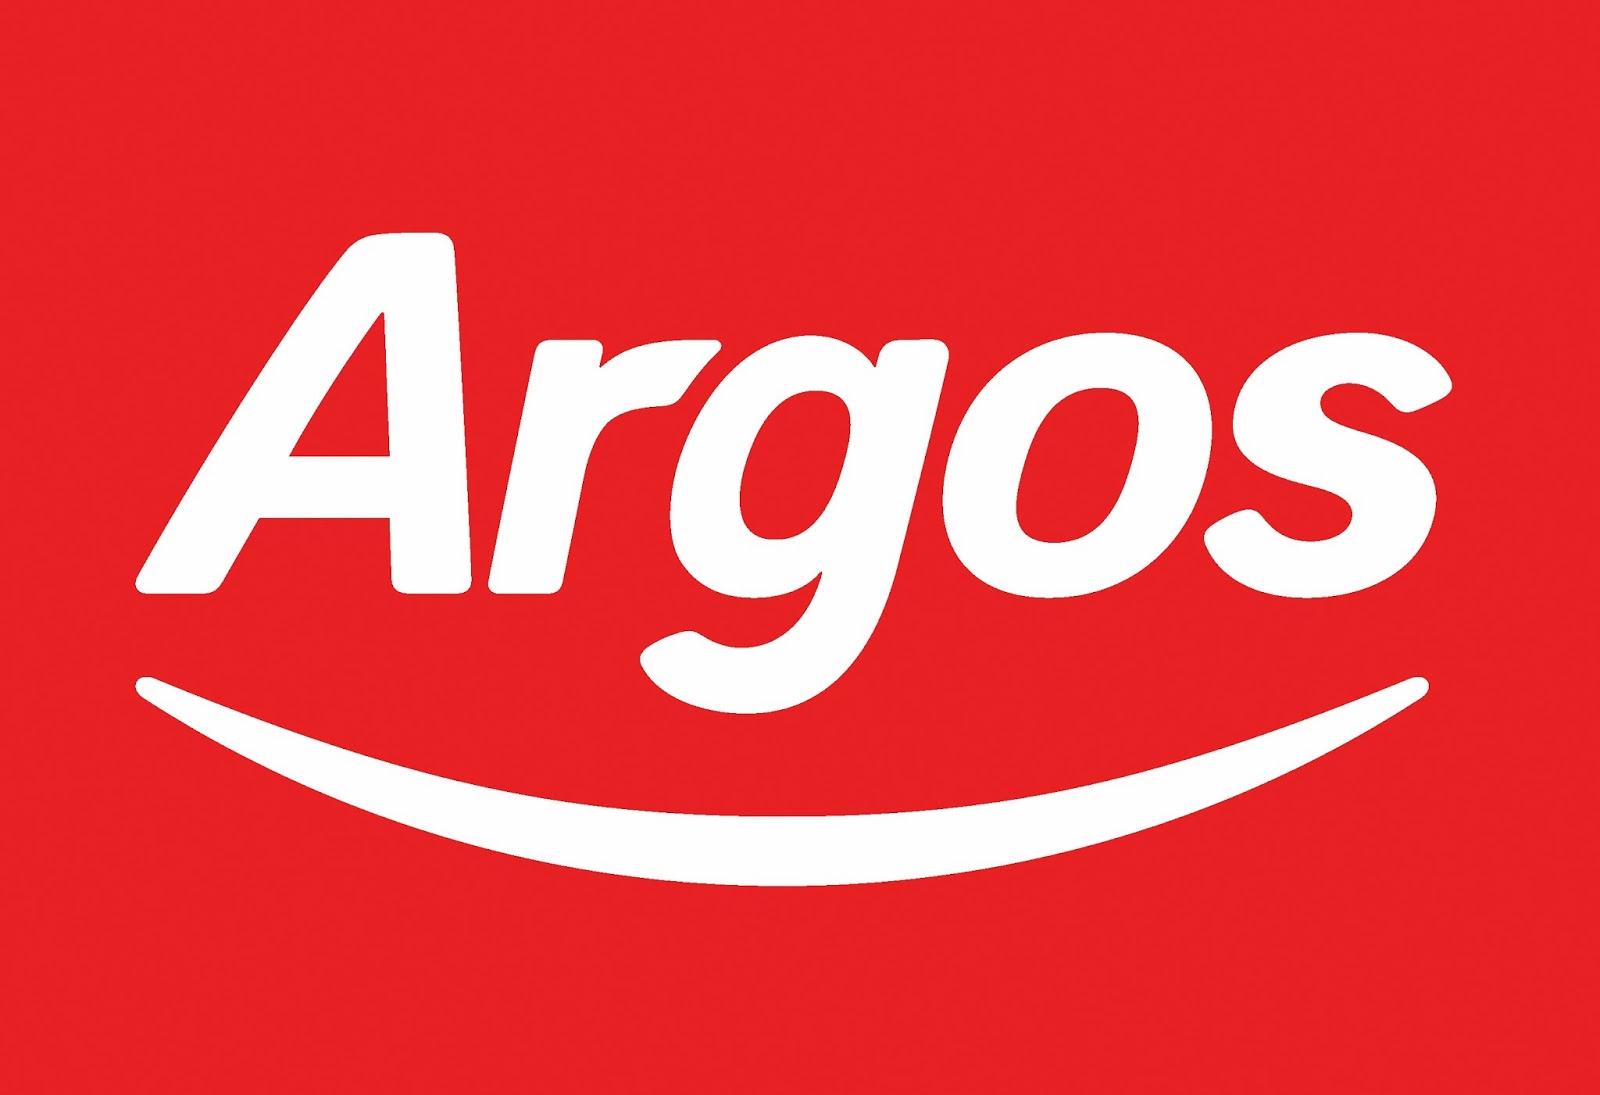 White apron argos -  Win A Samsung Led Hd Smart Tv